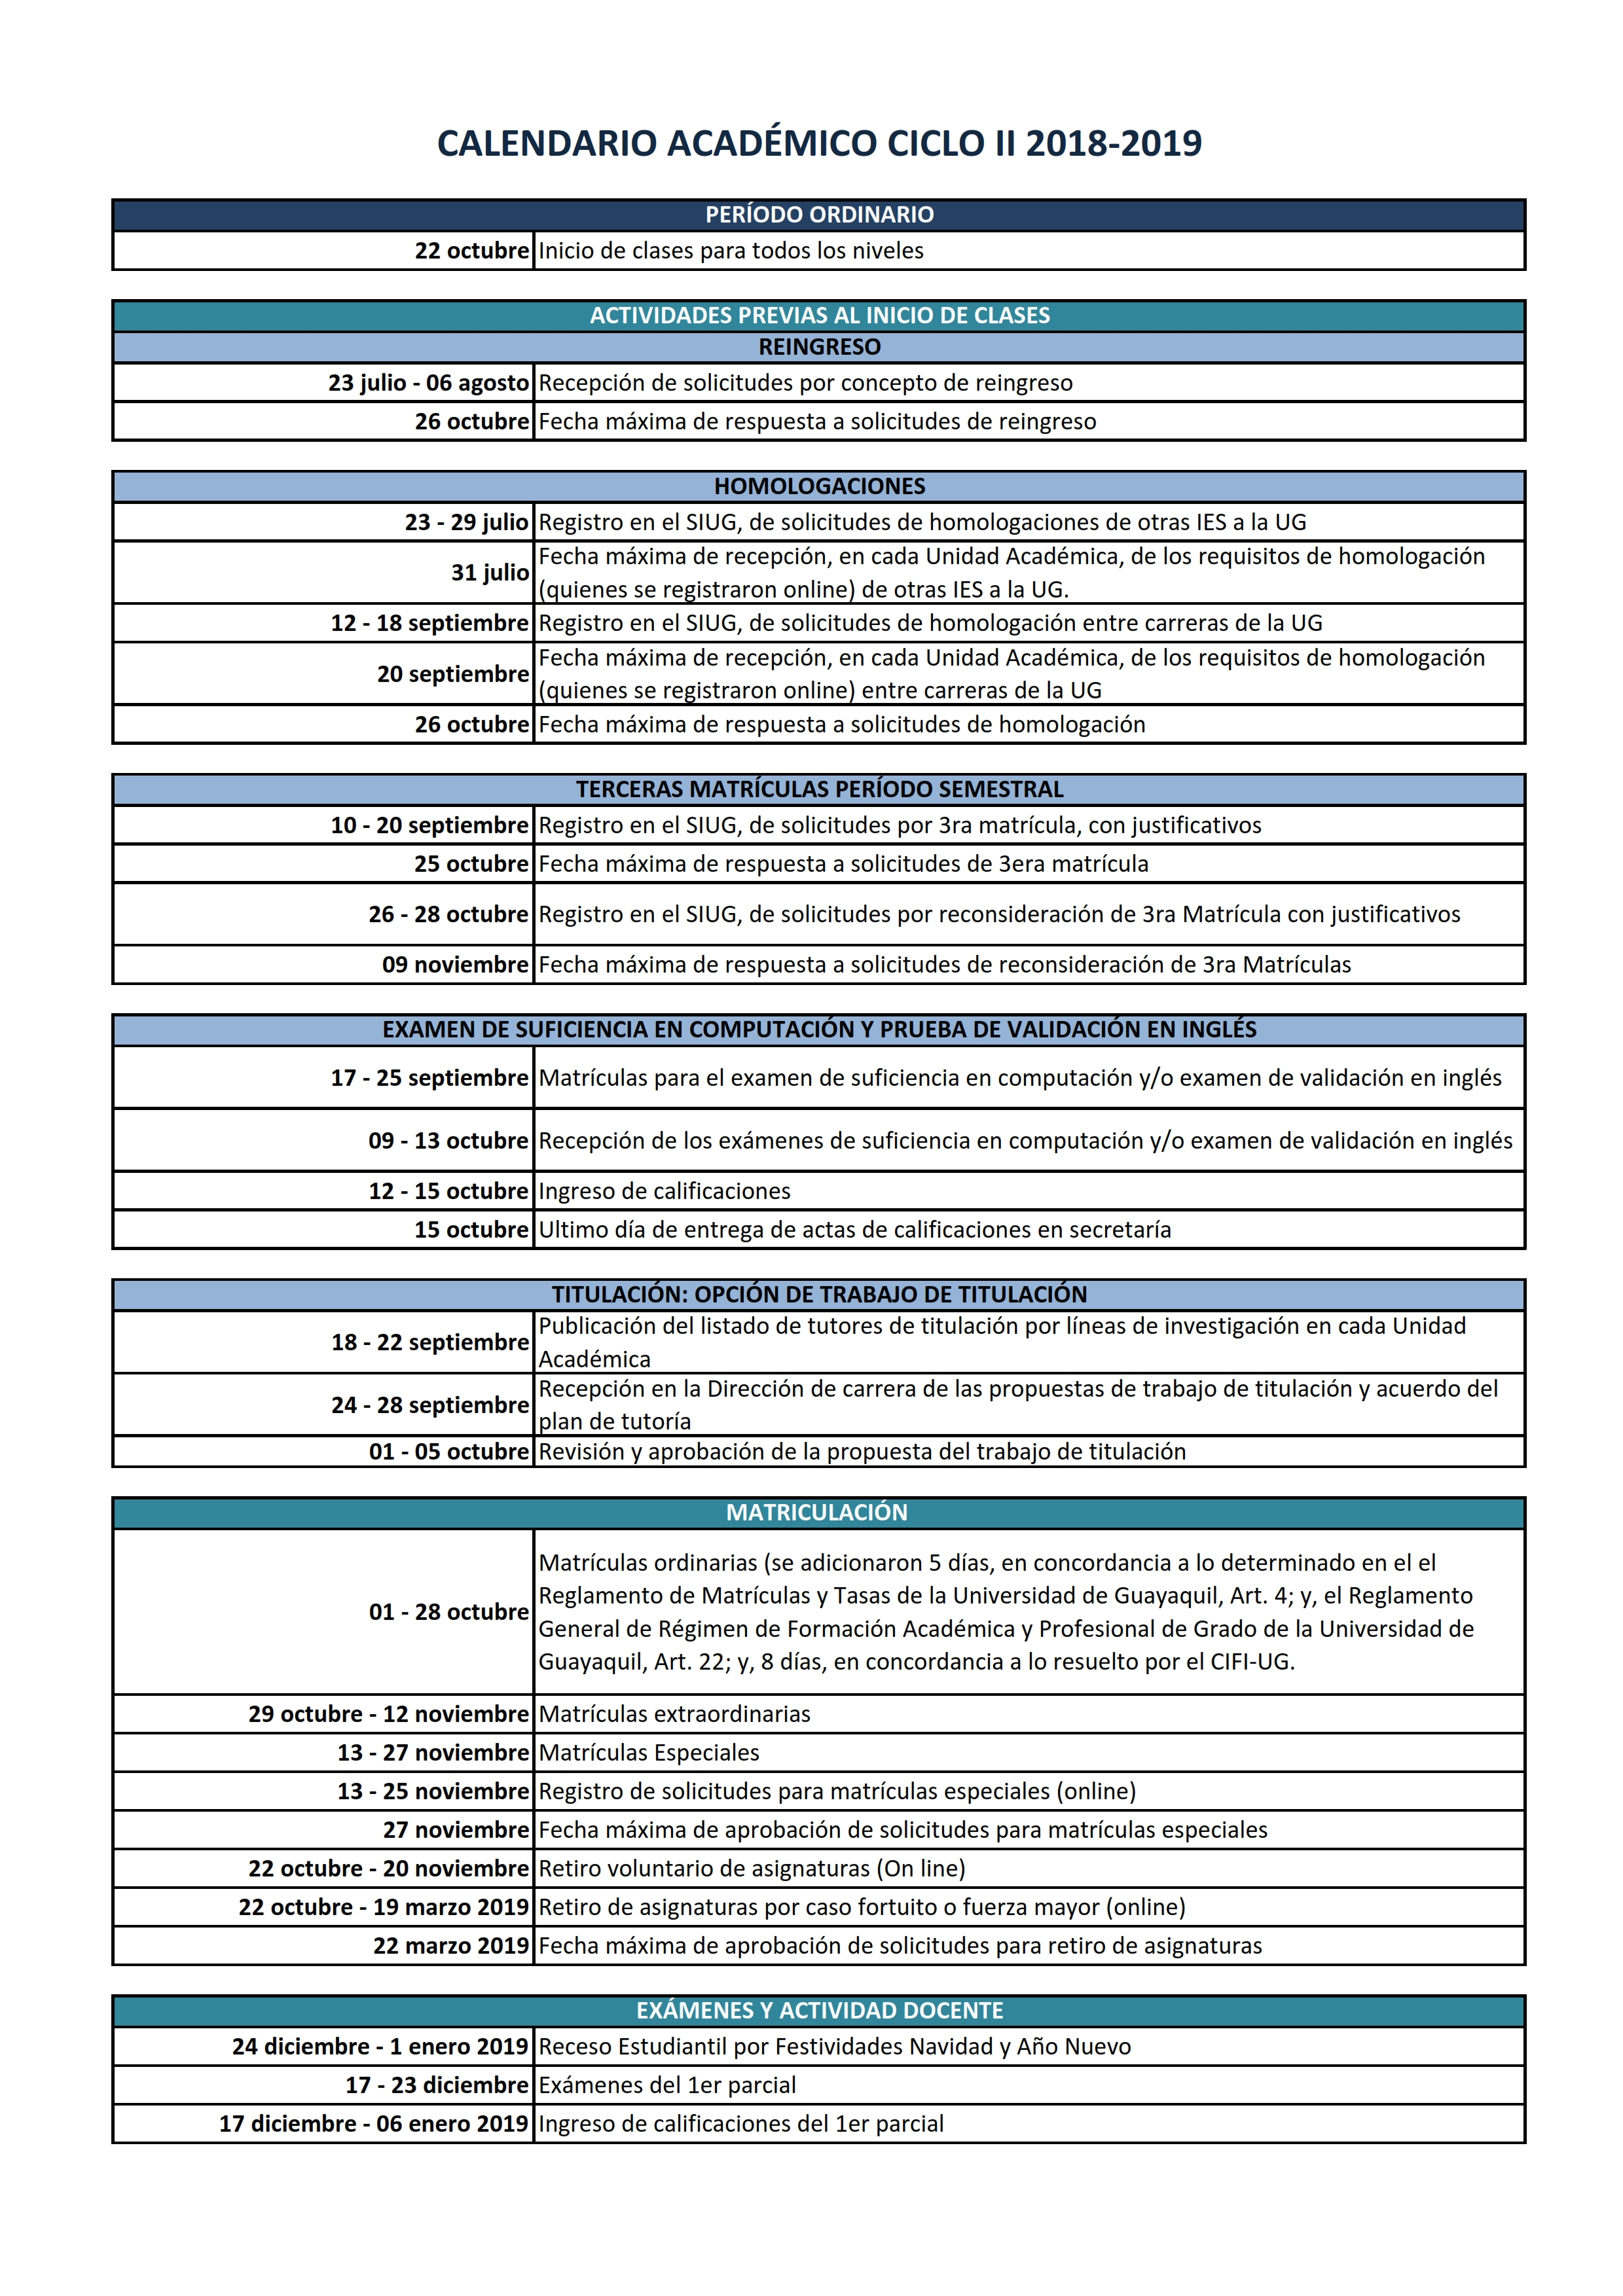 Calendario Académico Ciclo II 2018 – 2019.